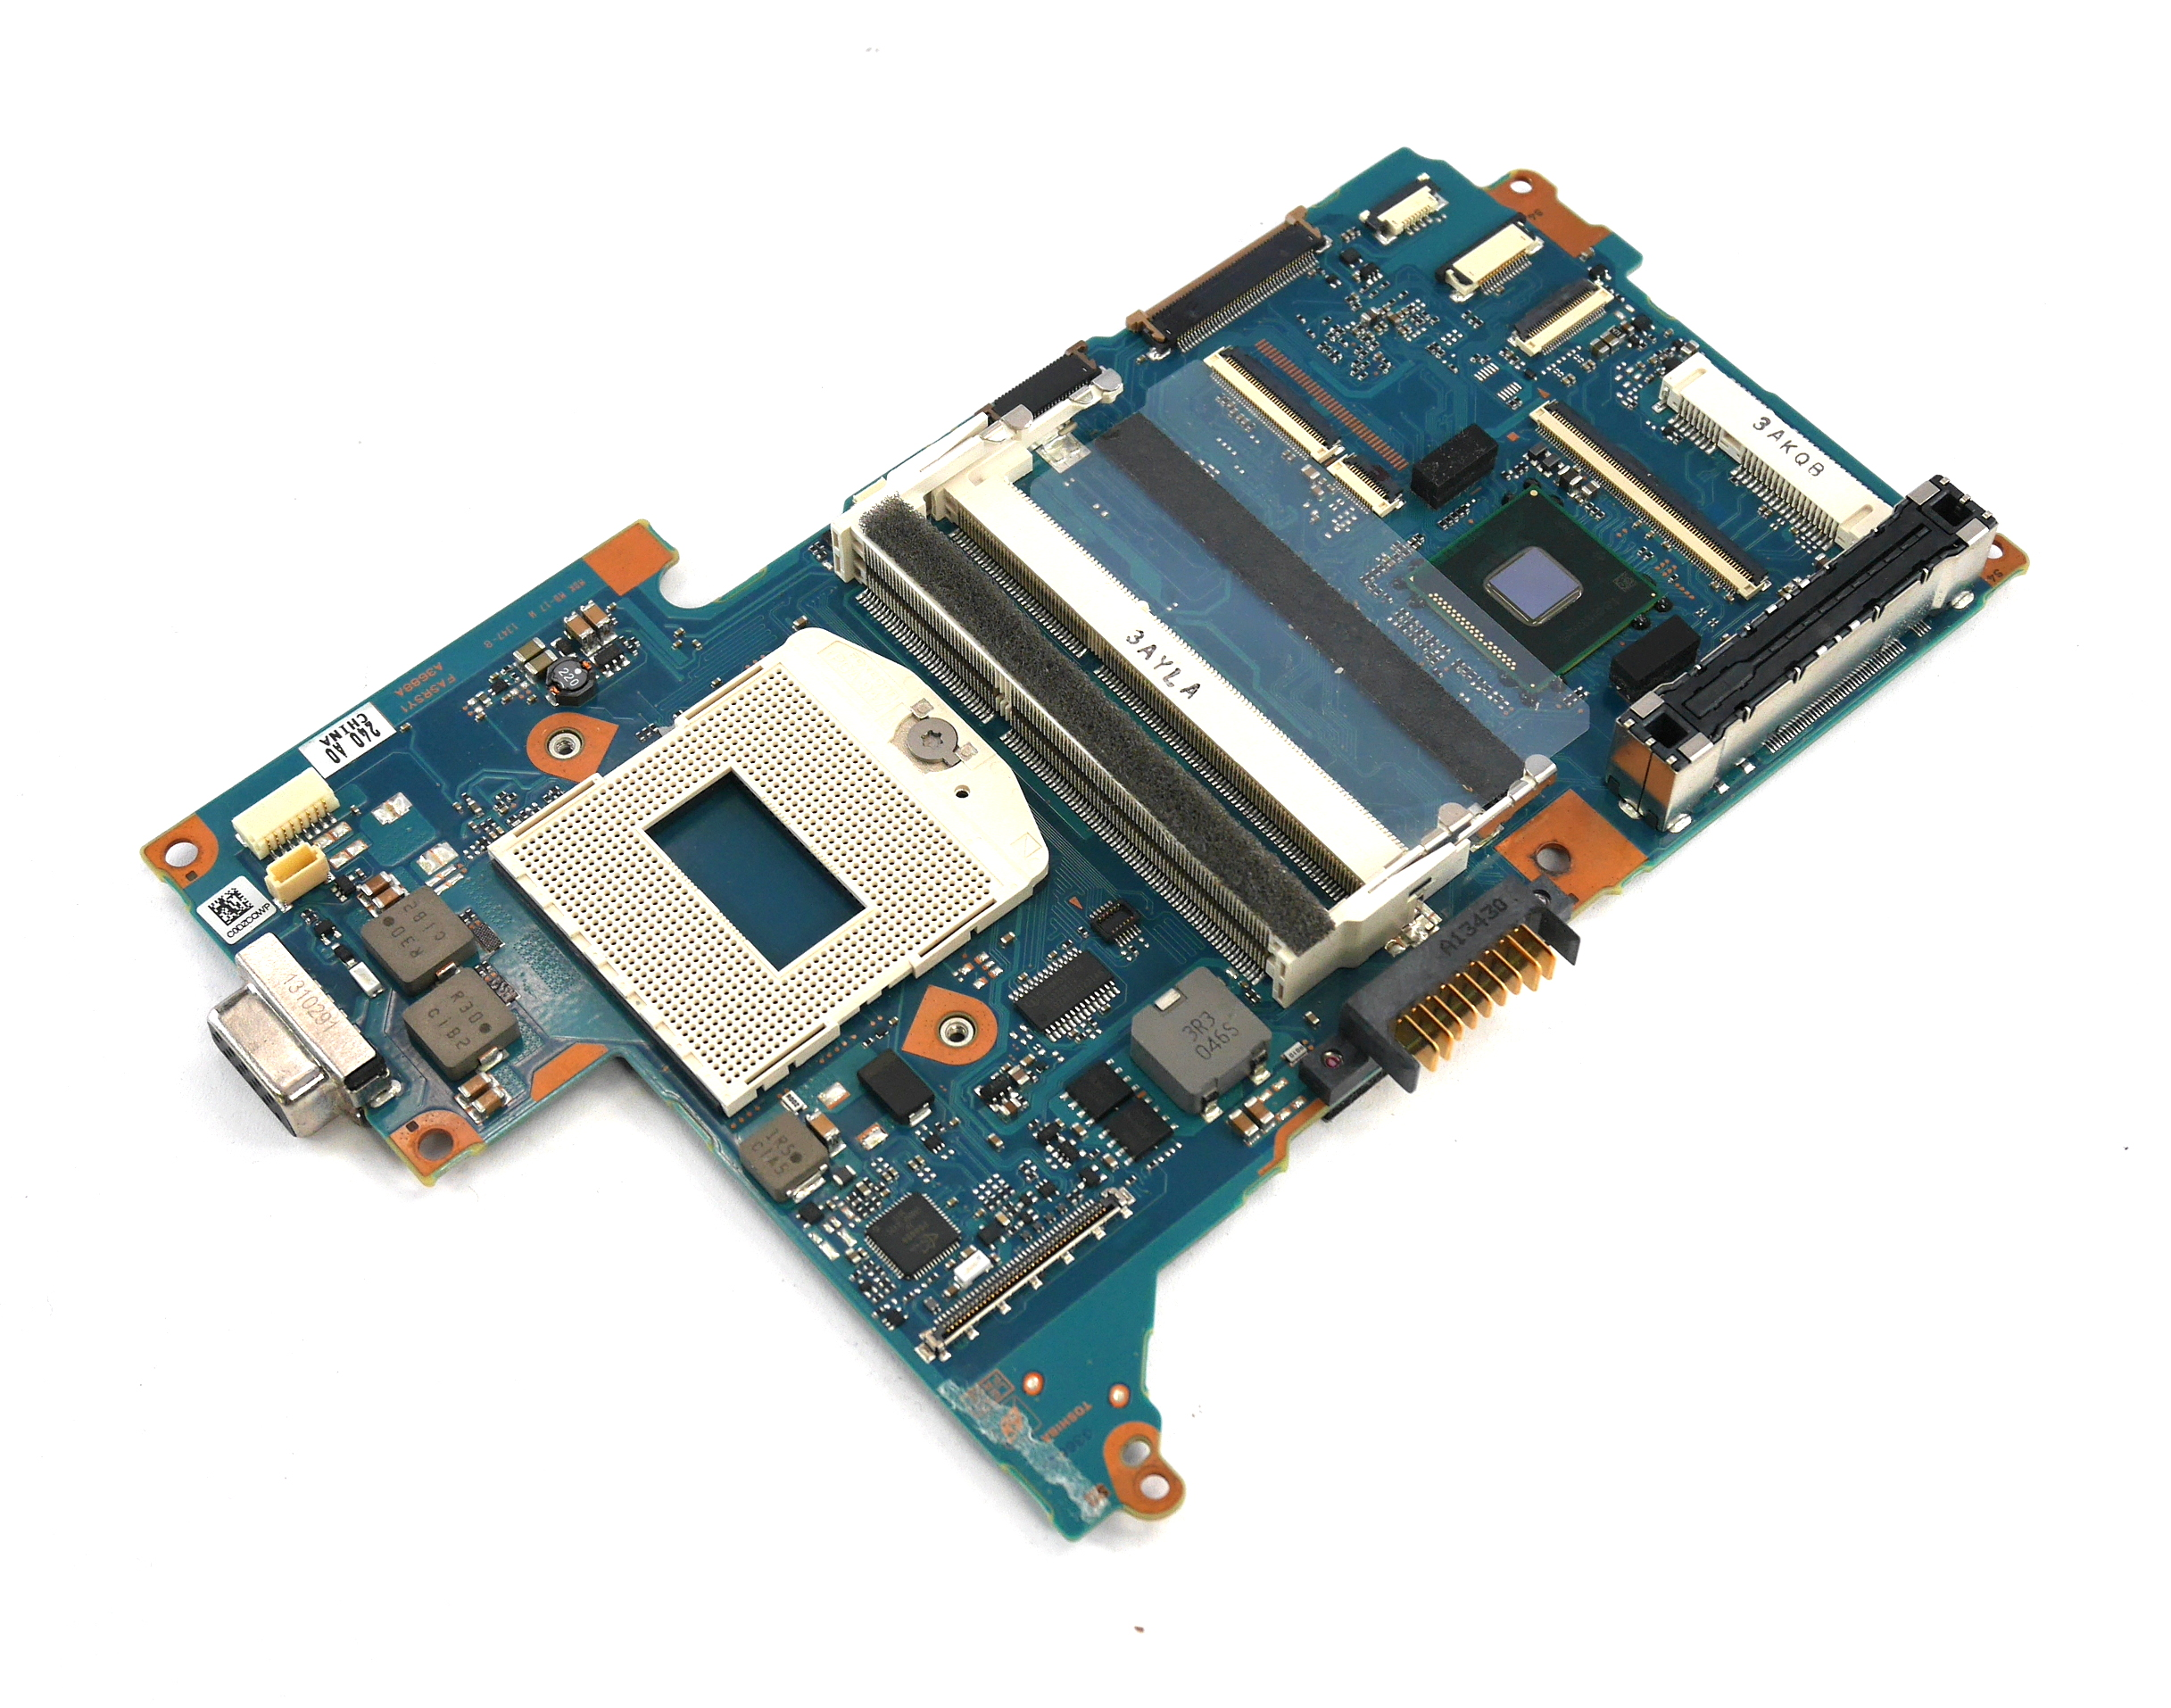 Toshiba FASRSY1 A3688A Portege R30-A-139 rPGA-947 Laptop Motherboard